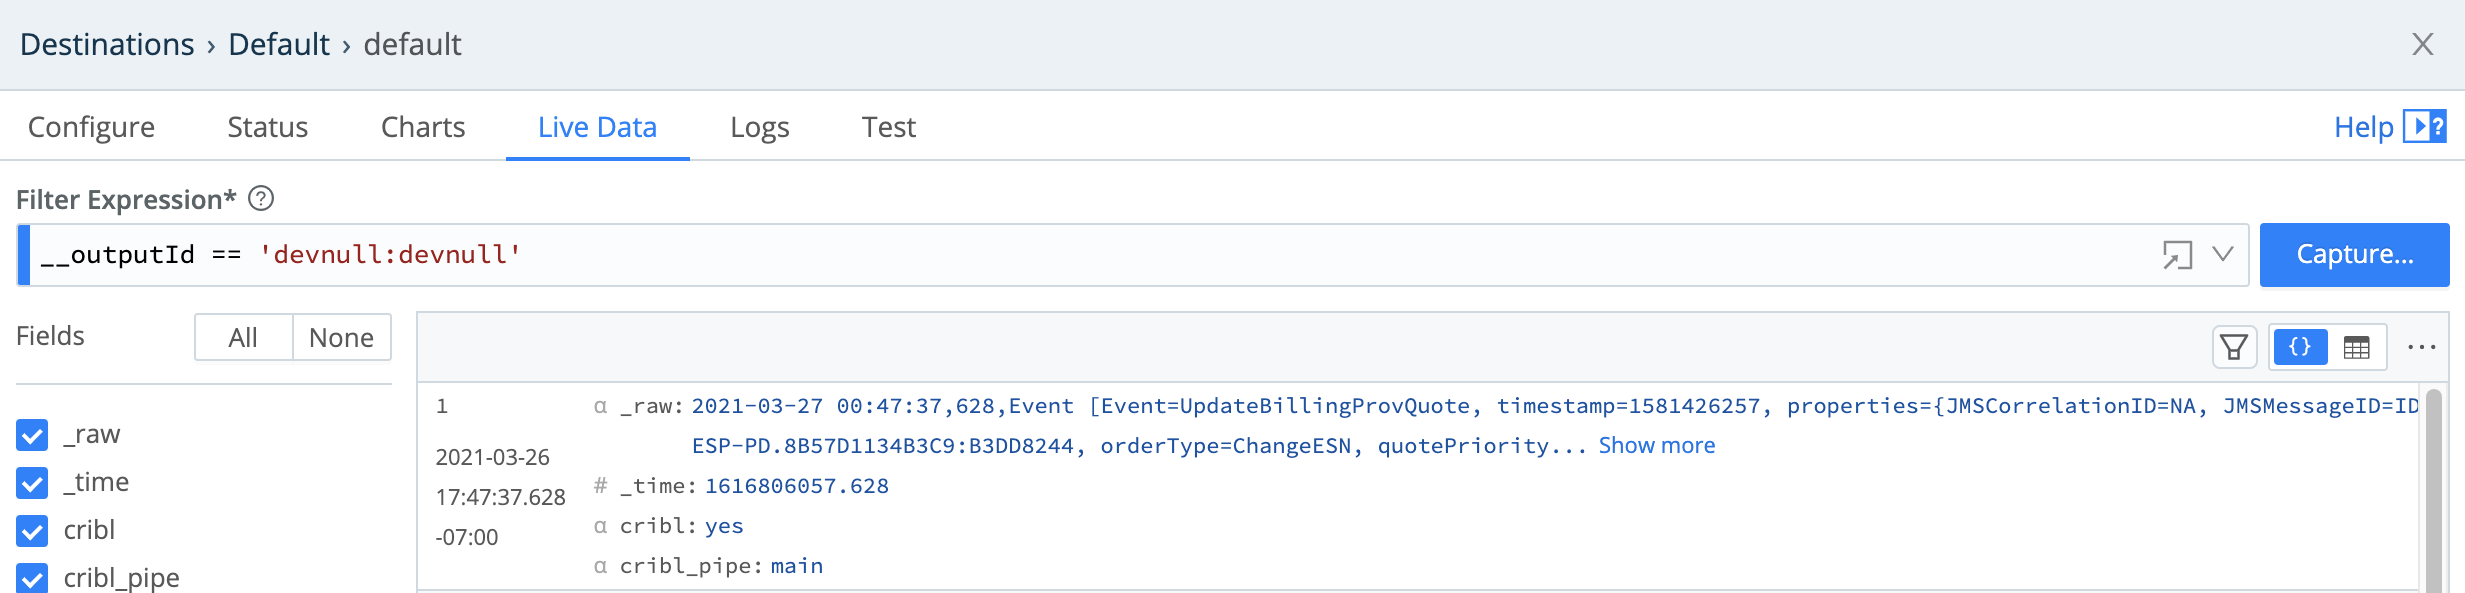 Destination modal > Live Data tab